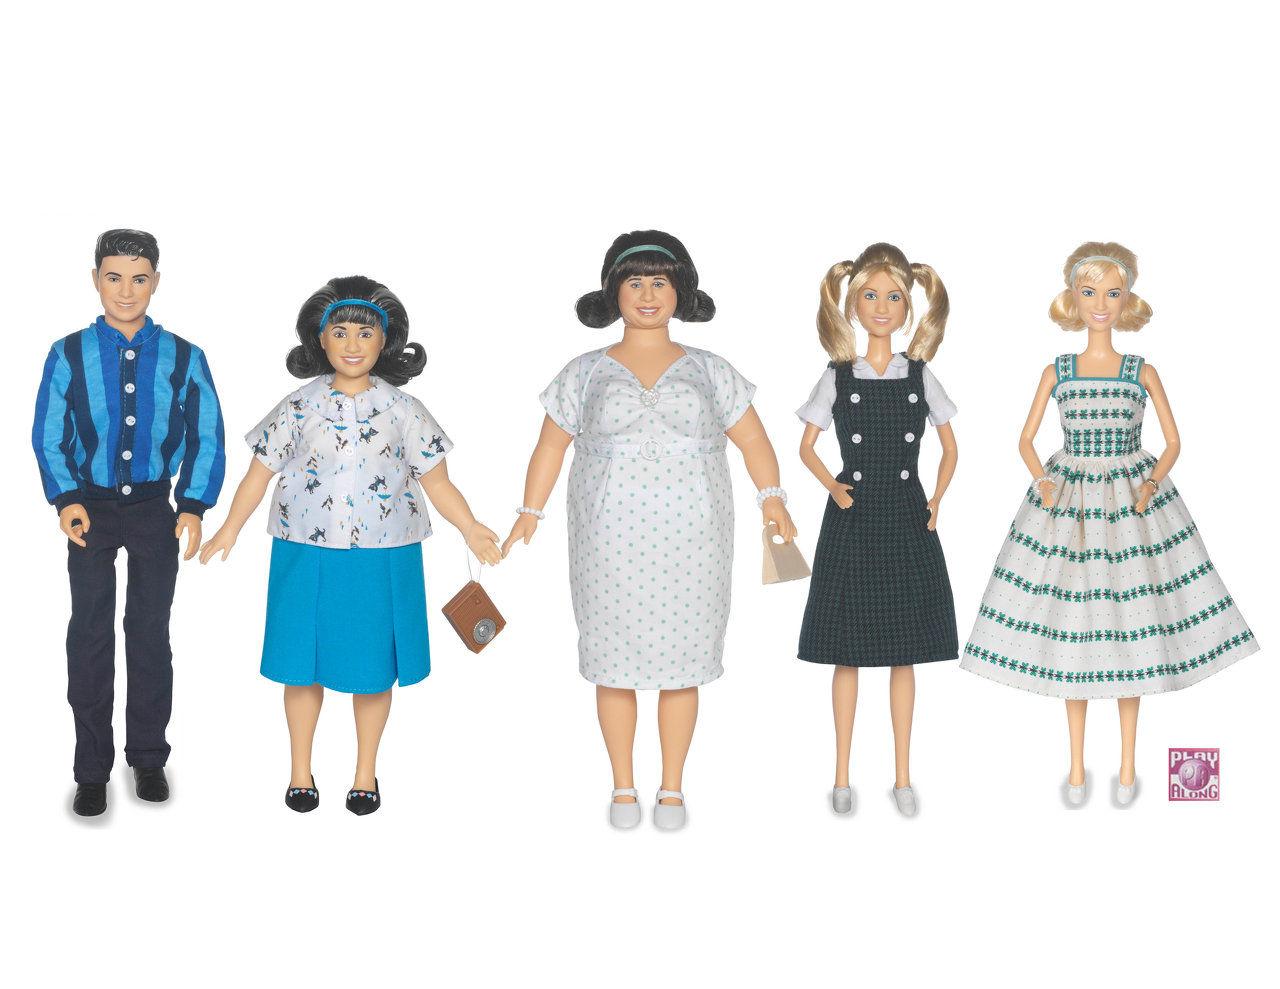 Design fashion dolls toys plush graphics